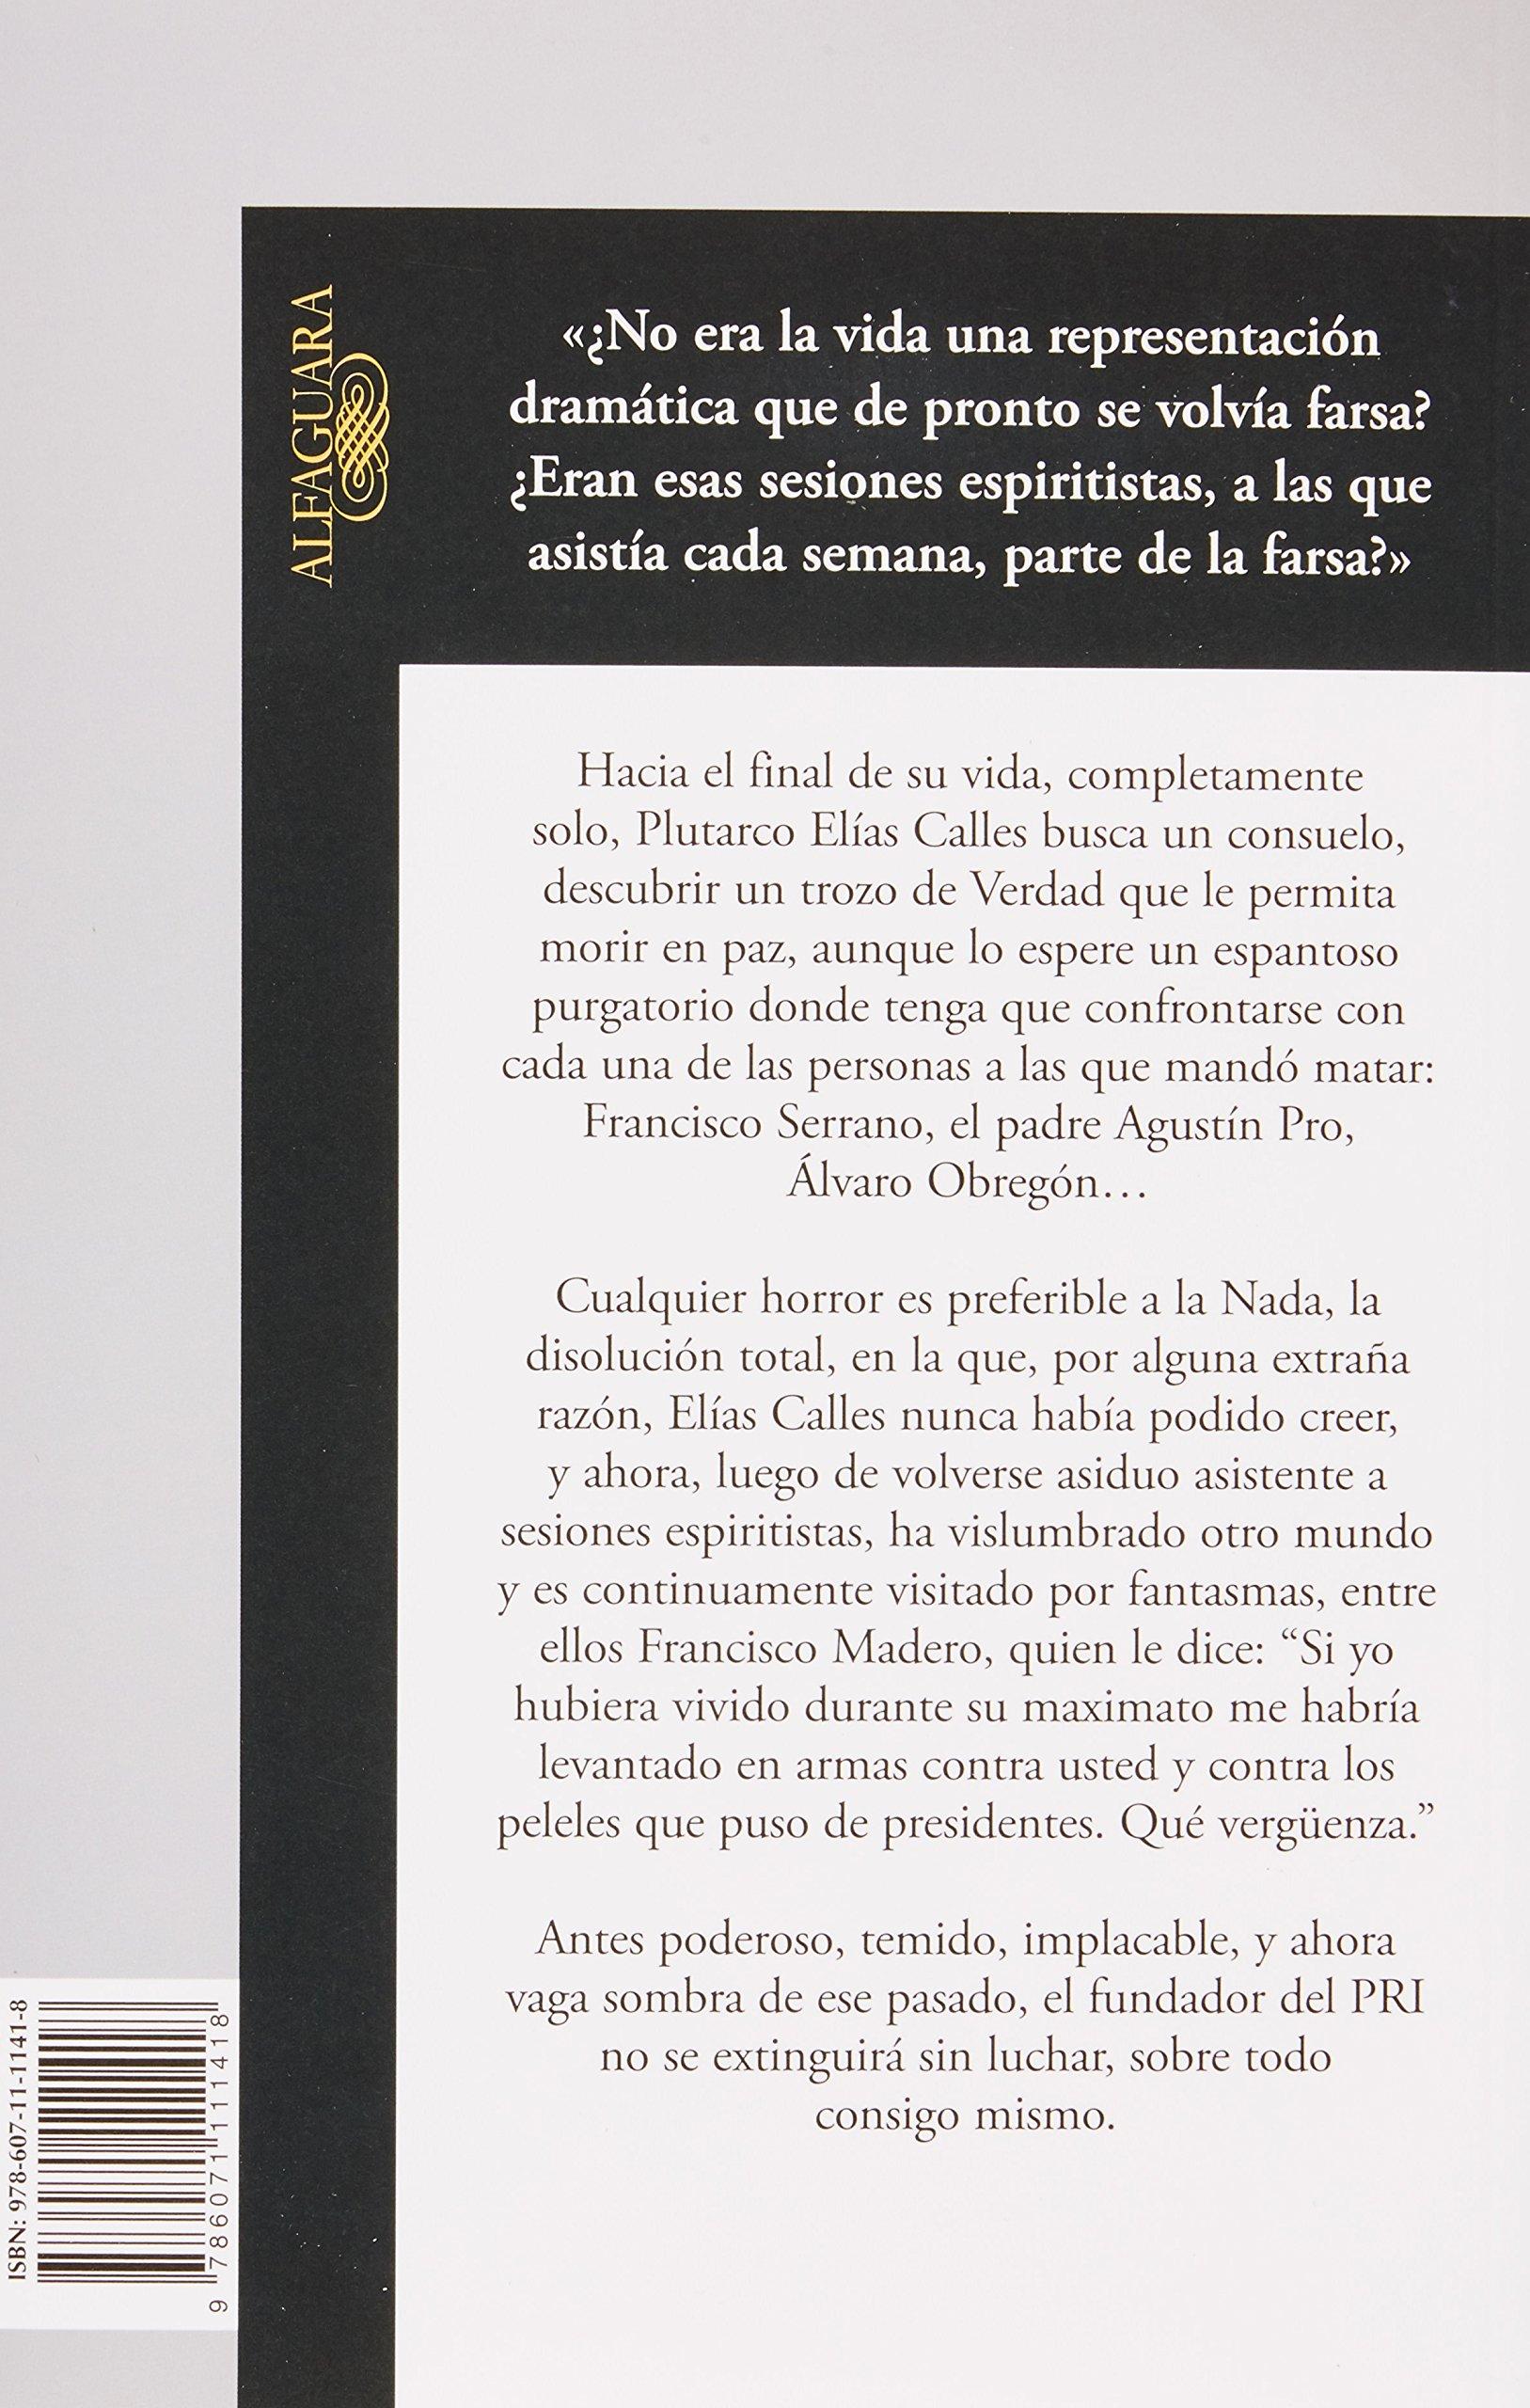 El jefe máximo (premio julio bracho): Ignacio Solares: 9786071111418: Amazon.com: Books